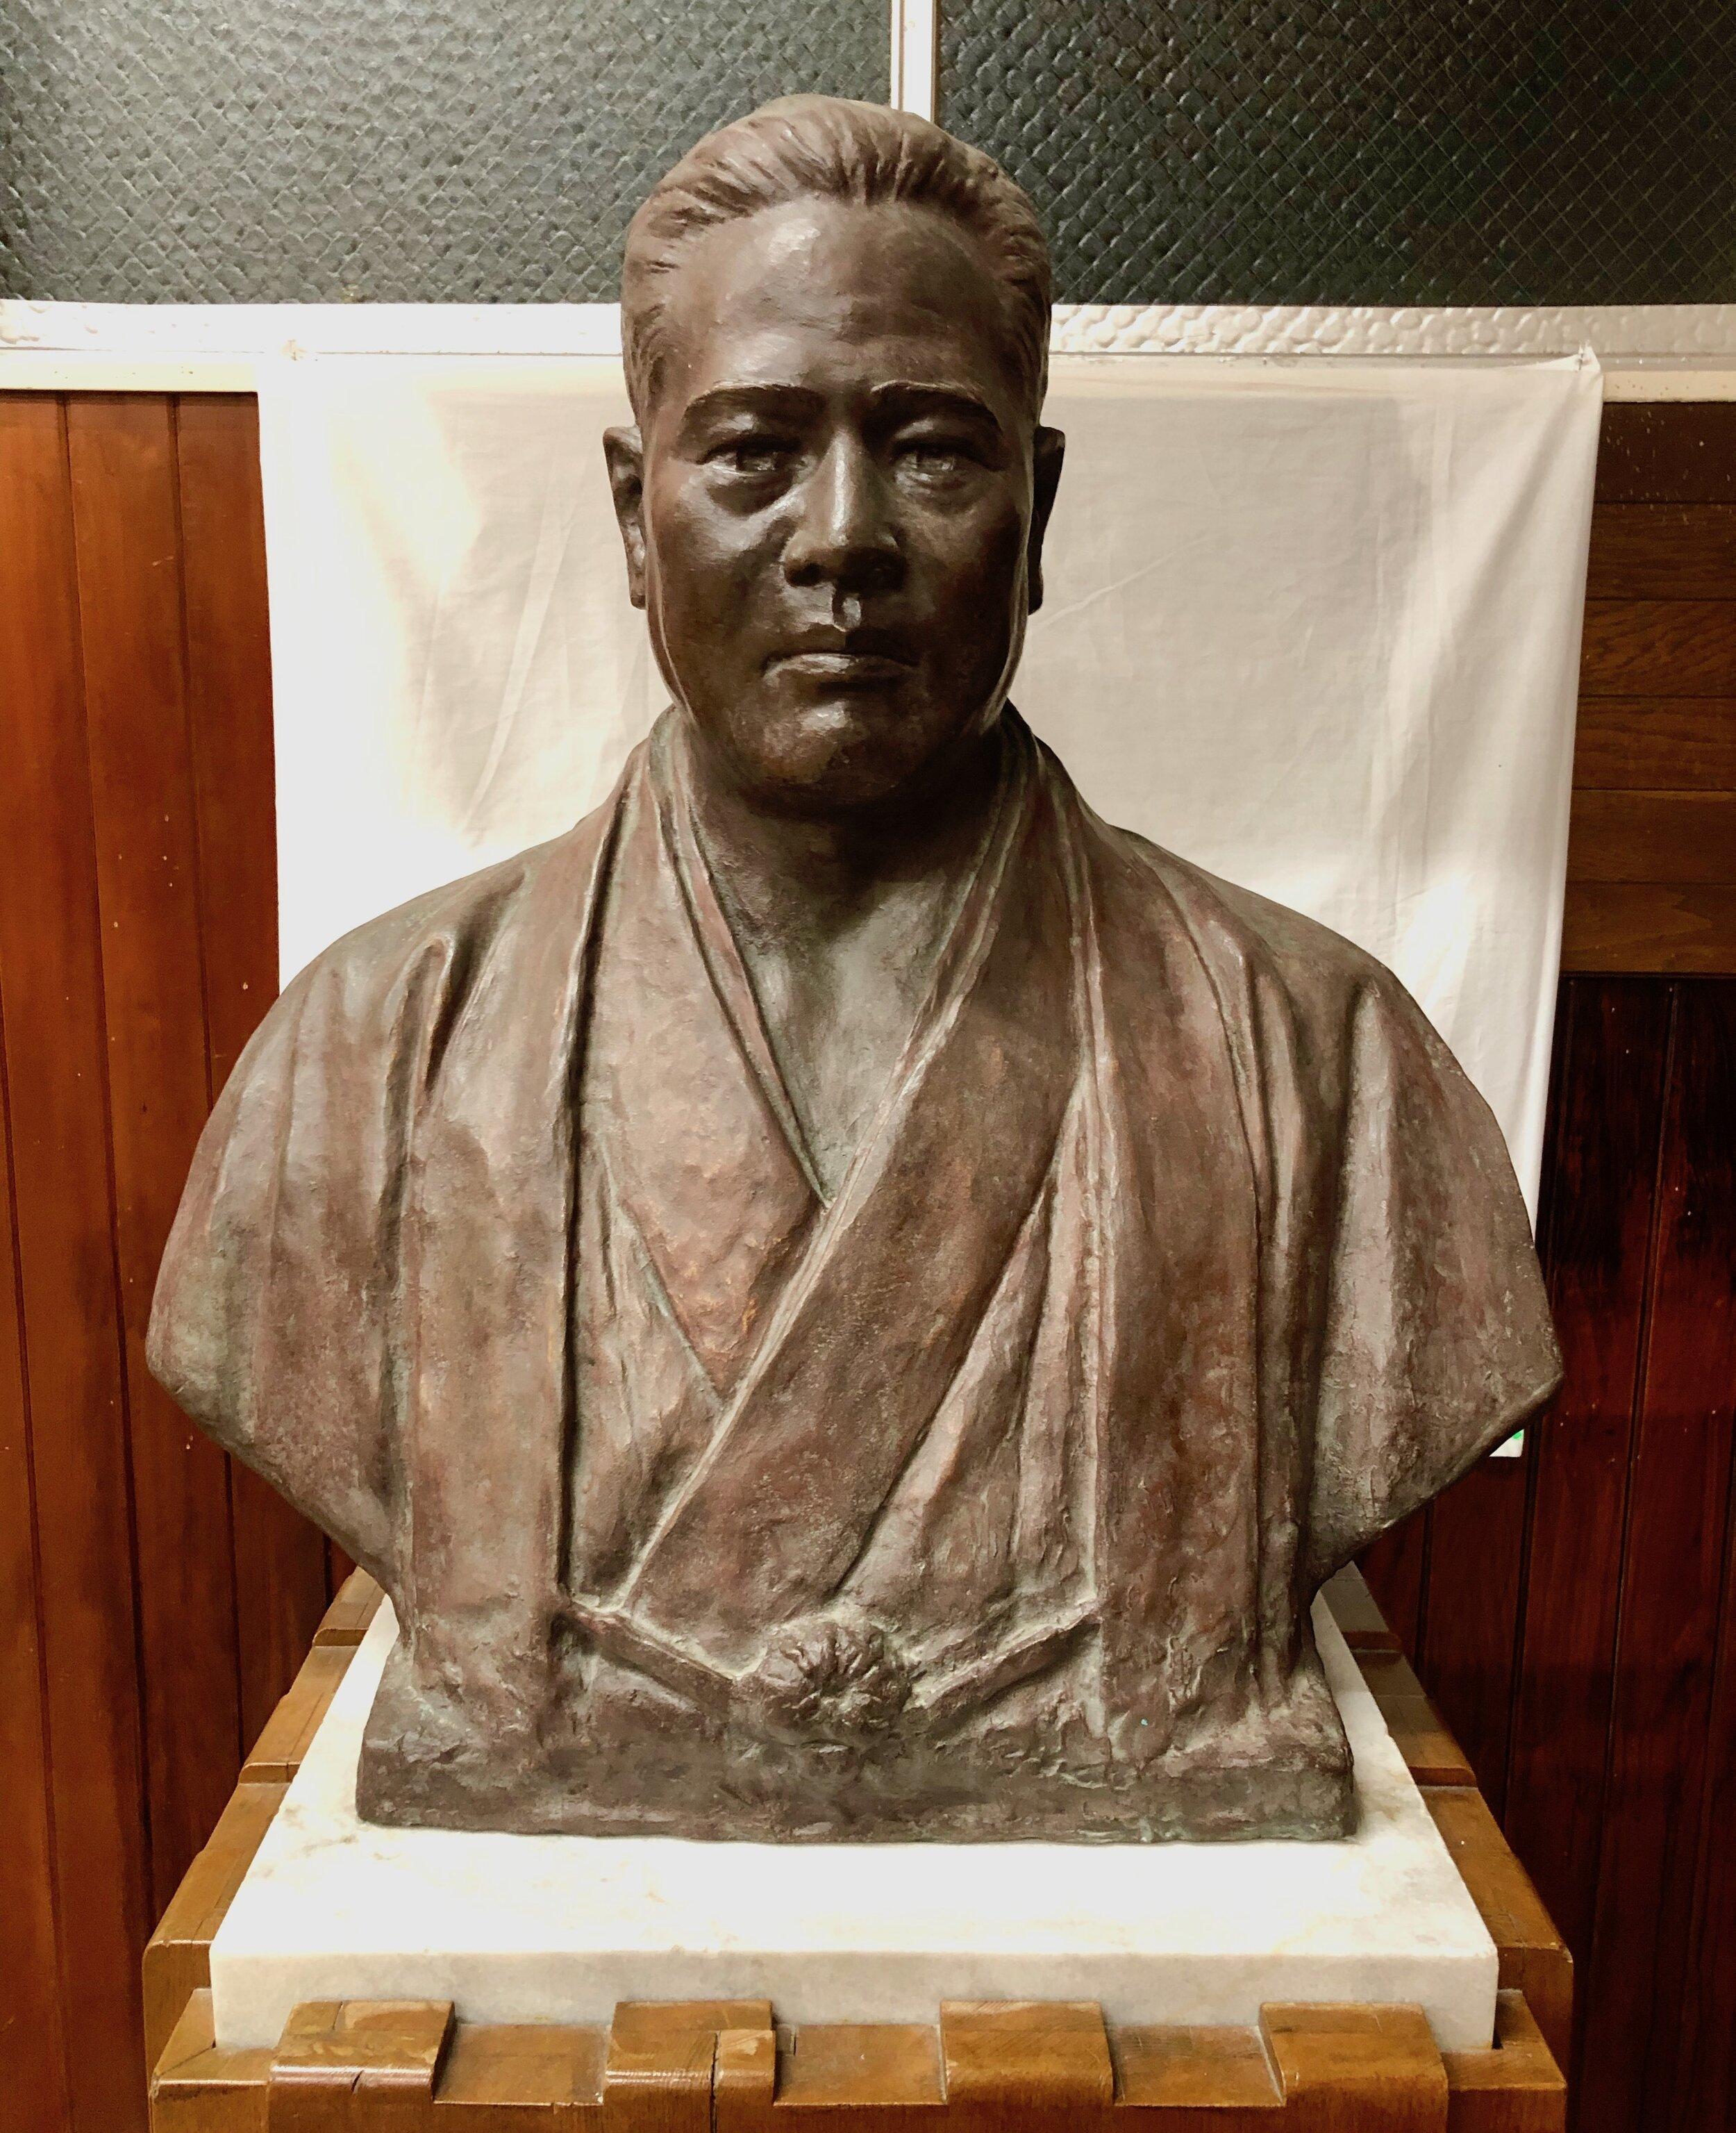 The bronze bust of Chojun Miyagi-sensei inside the Jundokan